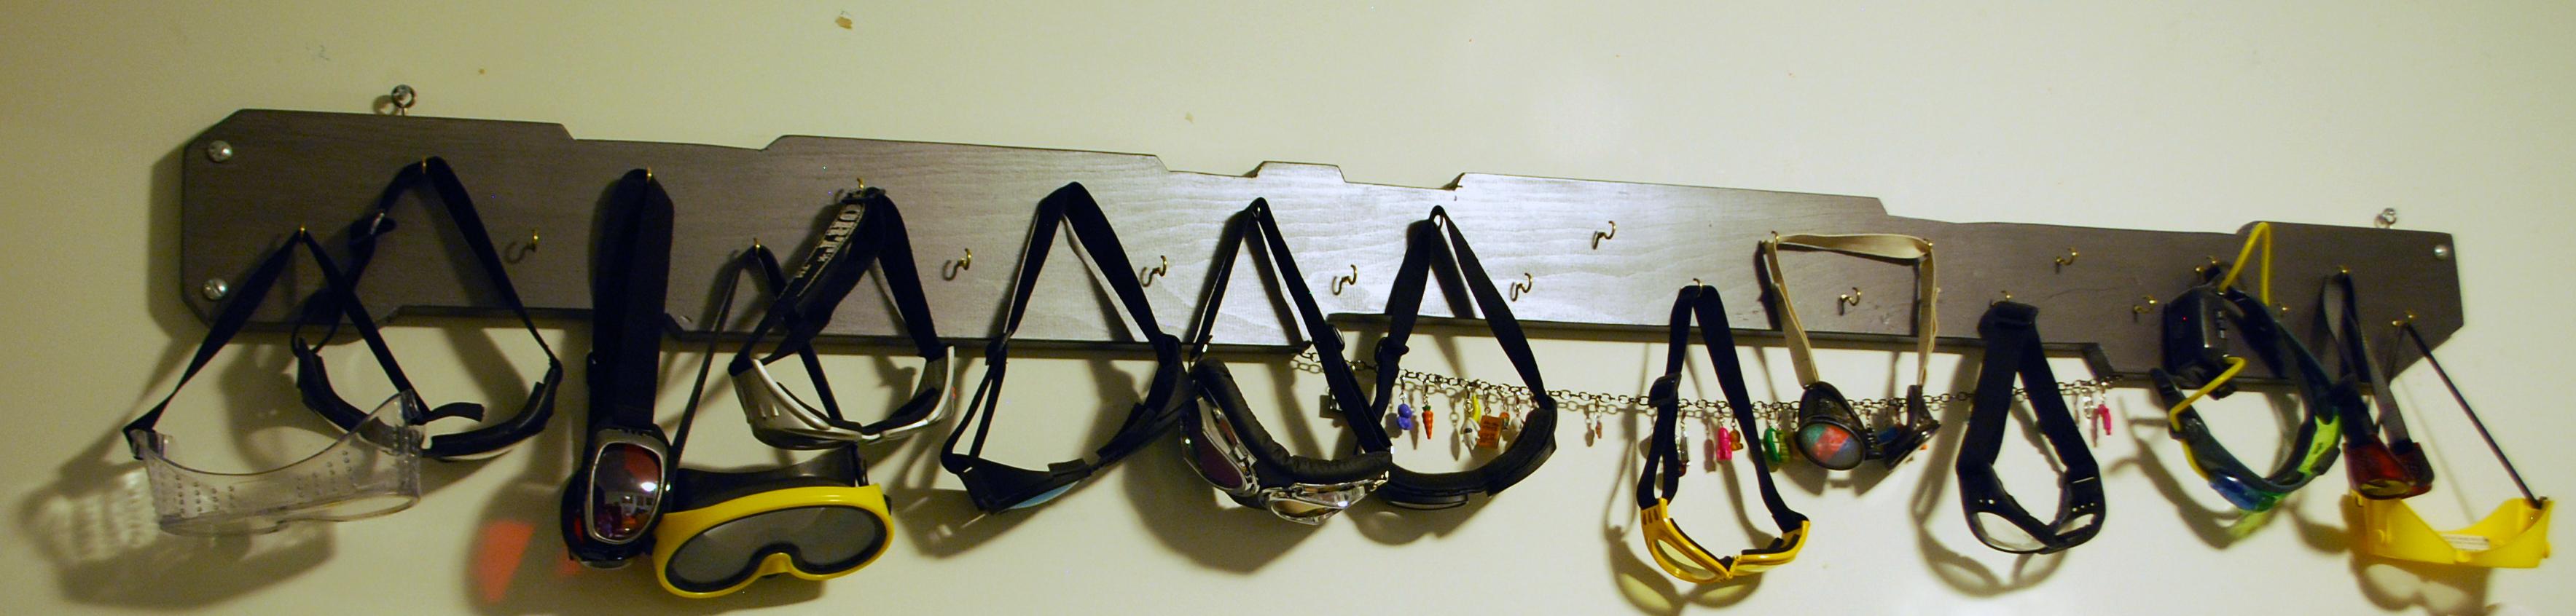 goggle rack